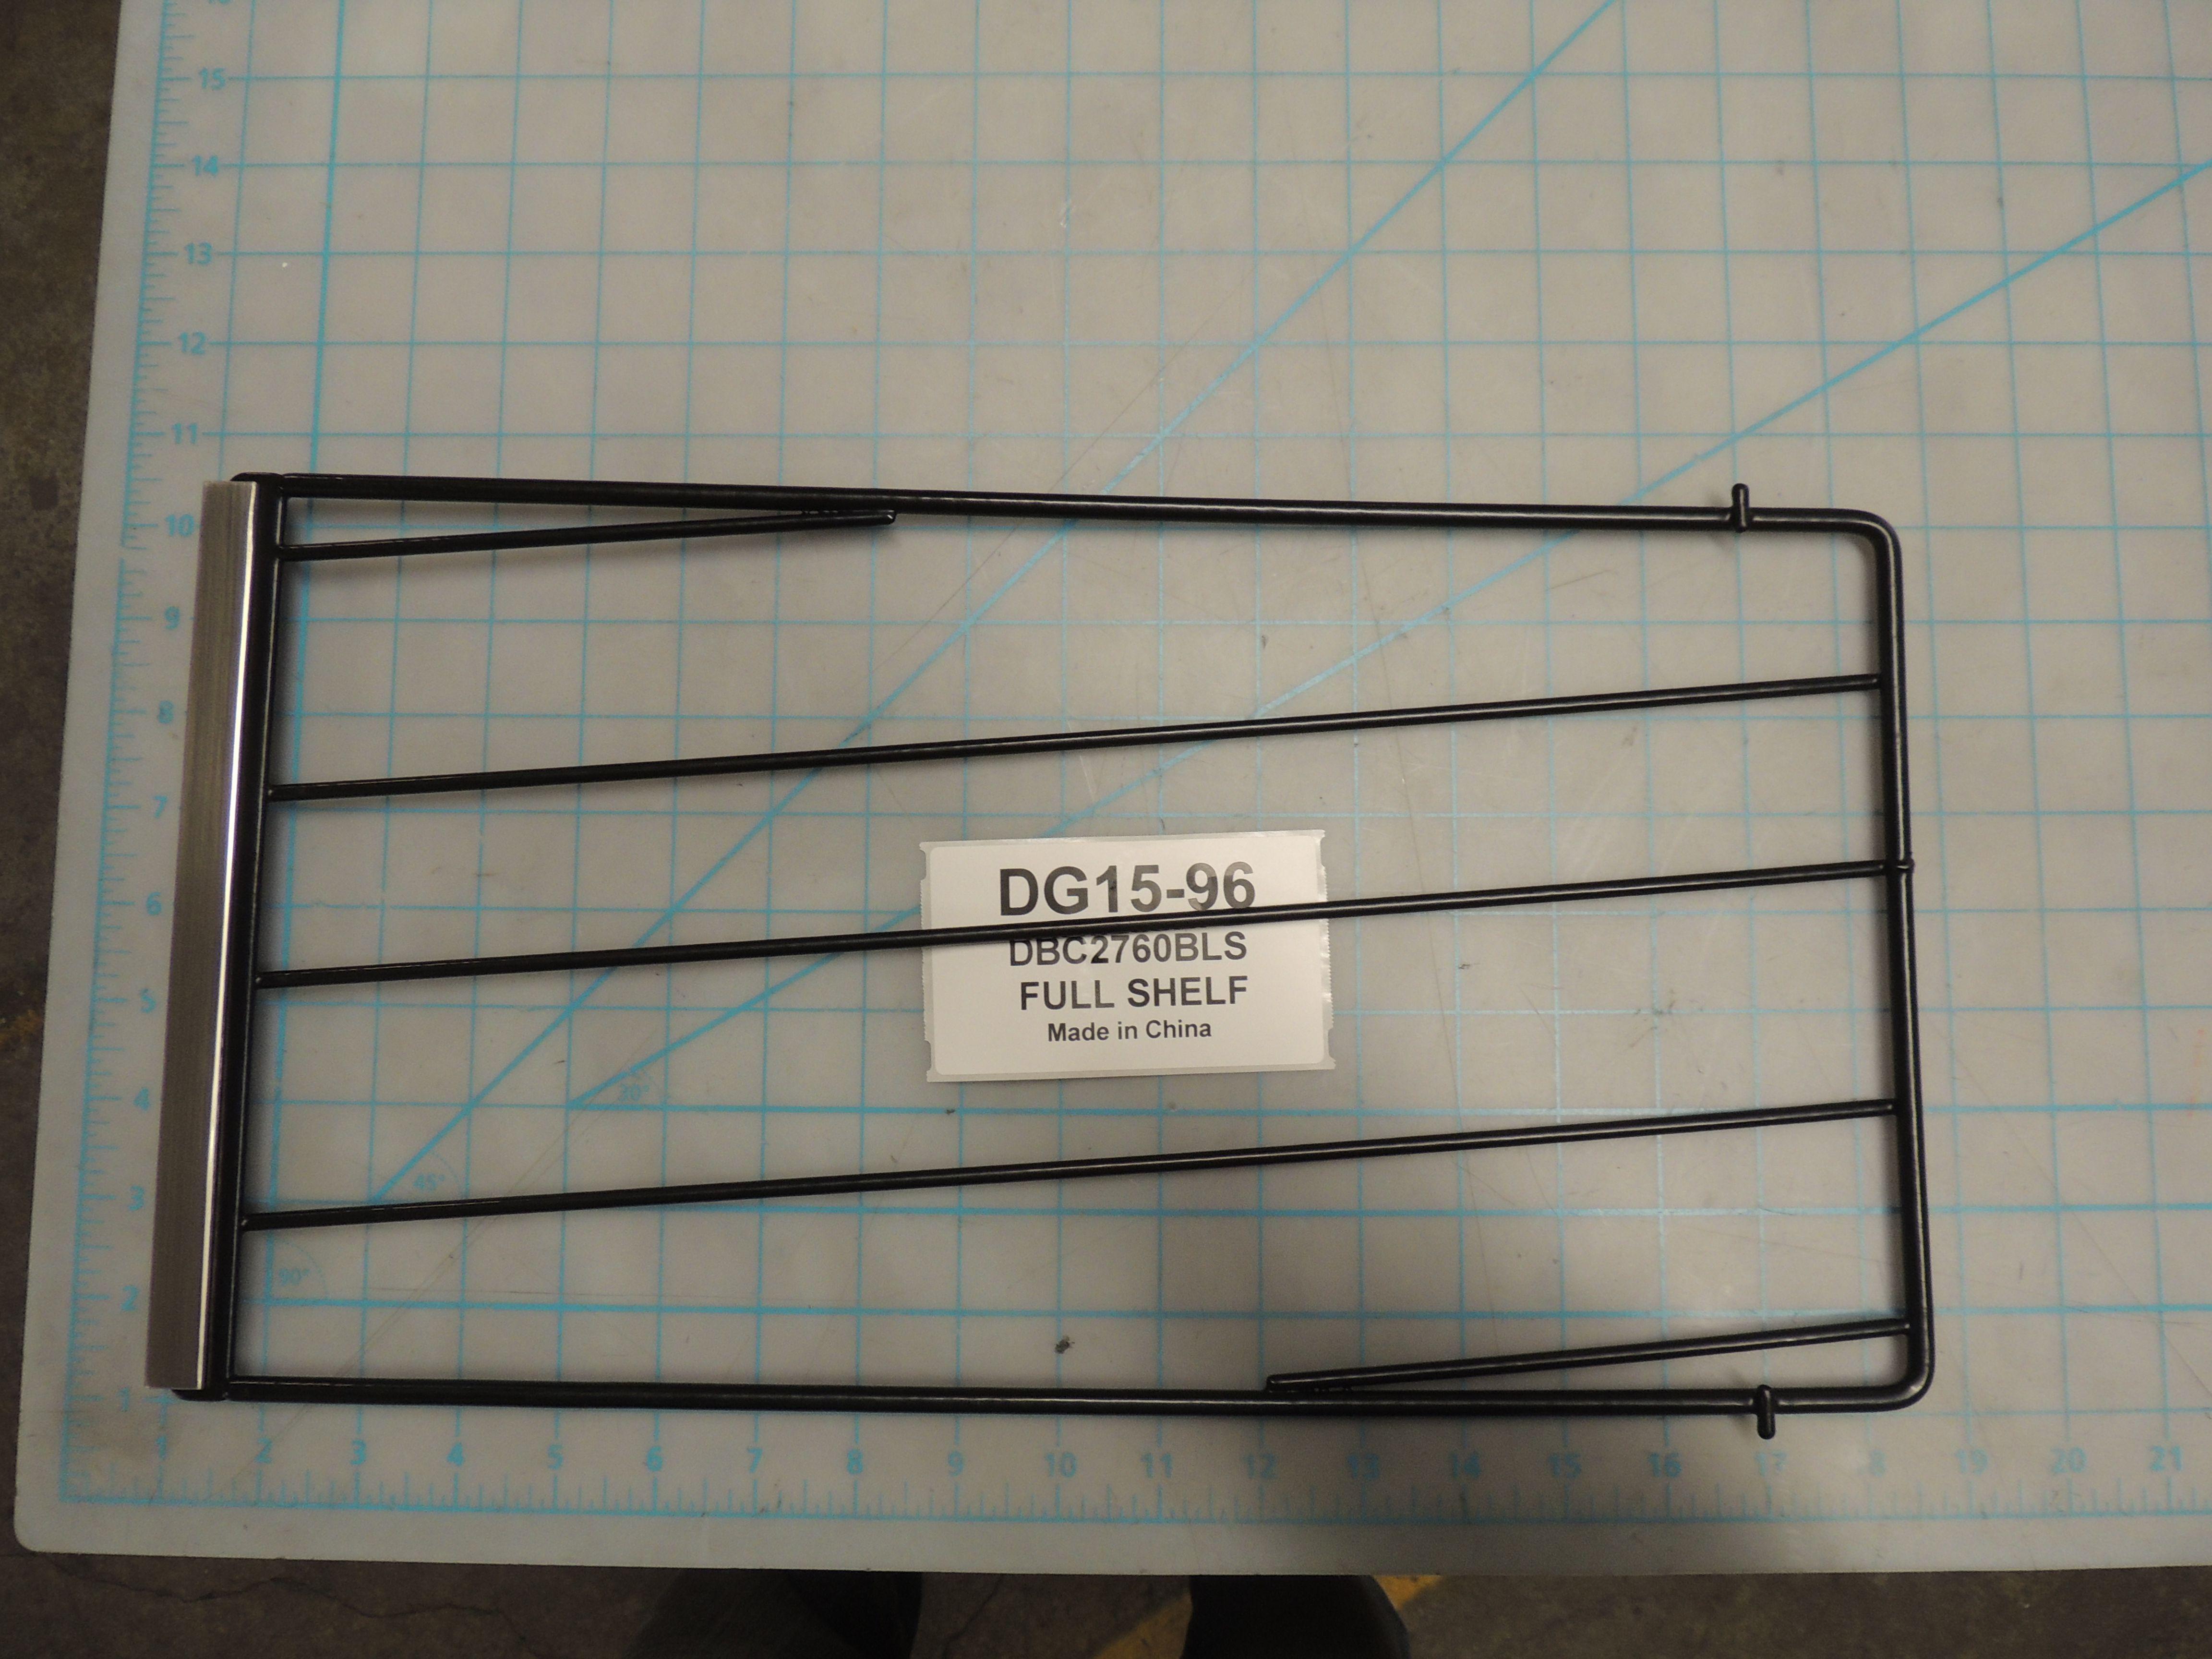 DBC2760BLS FULL SHELF